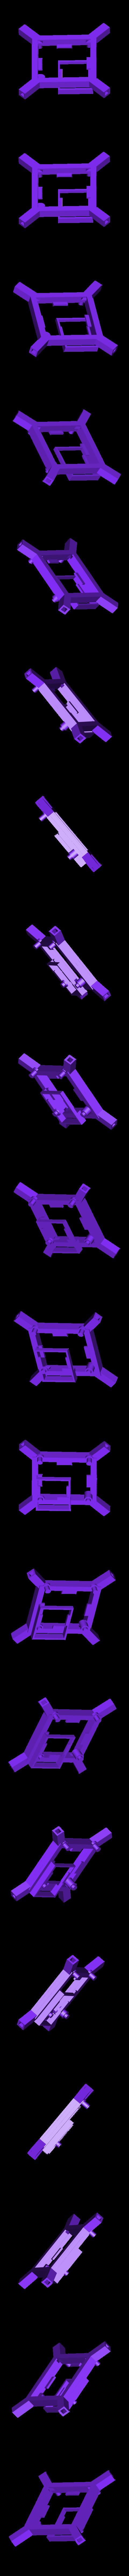 frame_main.stl Download free STL file Mini FPV quad copter kit for V929 or HK Q-bot • Design to 3D print, 3dxl